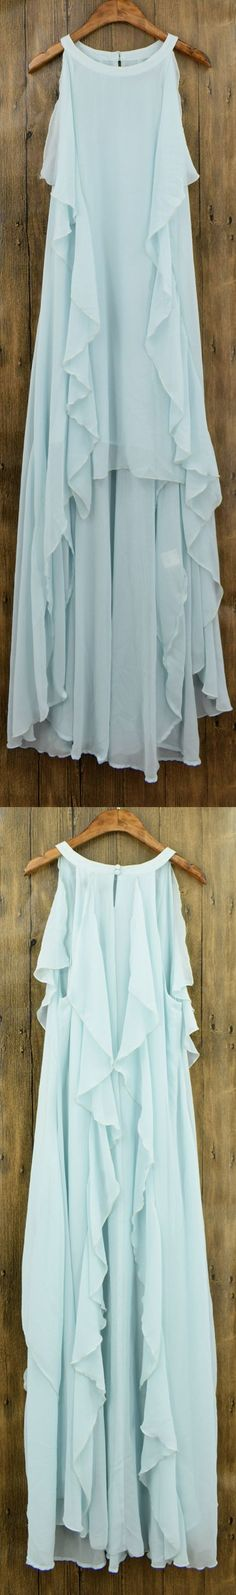 Azbro's Women's Flounce Decor Sleeveless Asymmetric Chiffon Dress